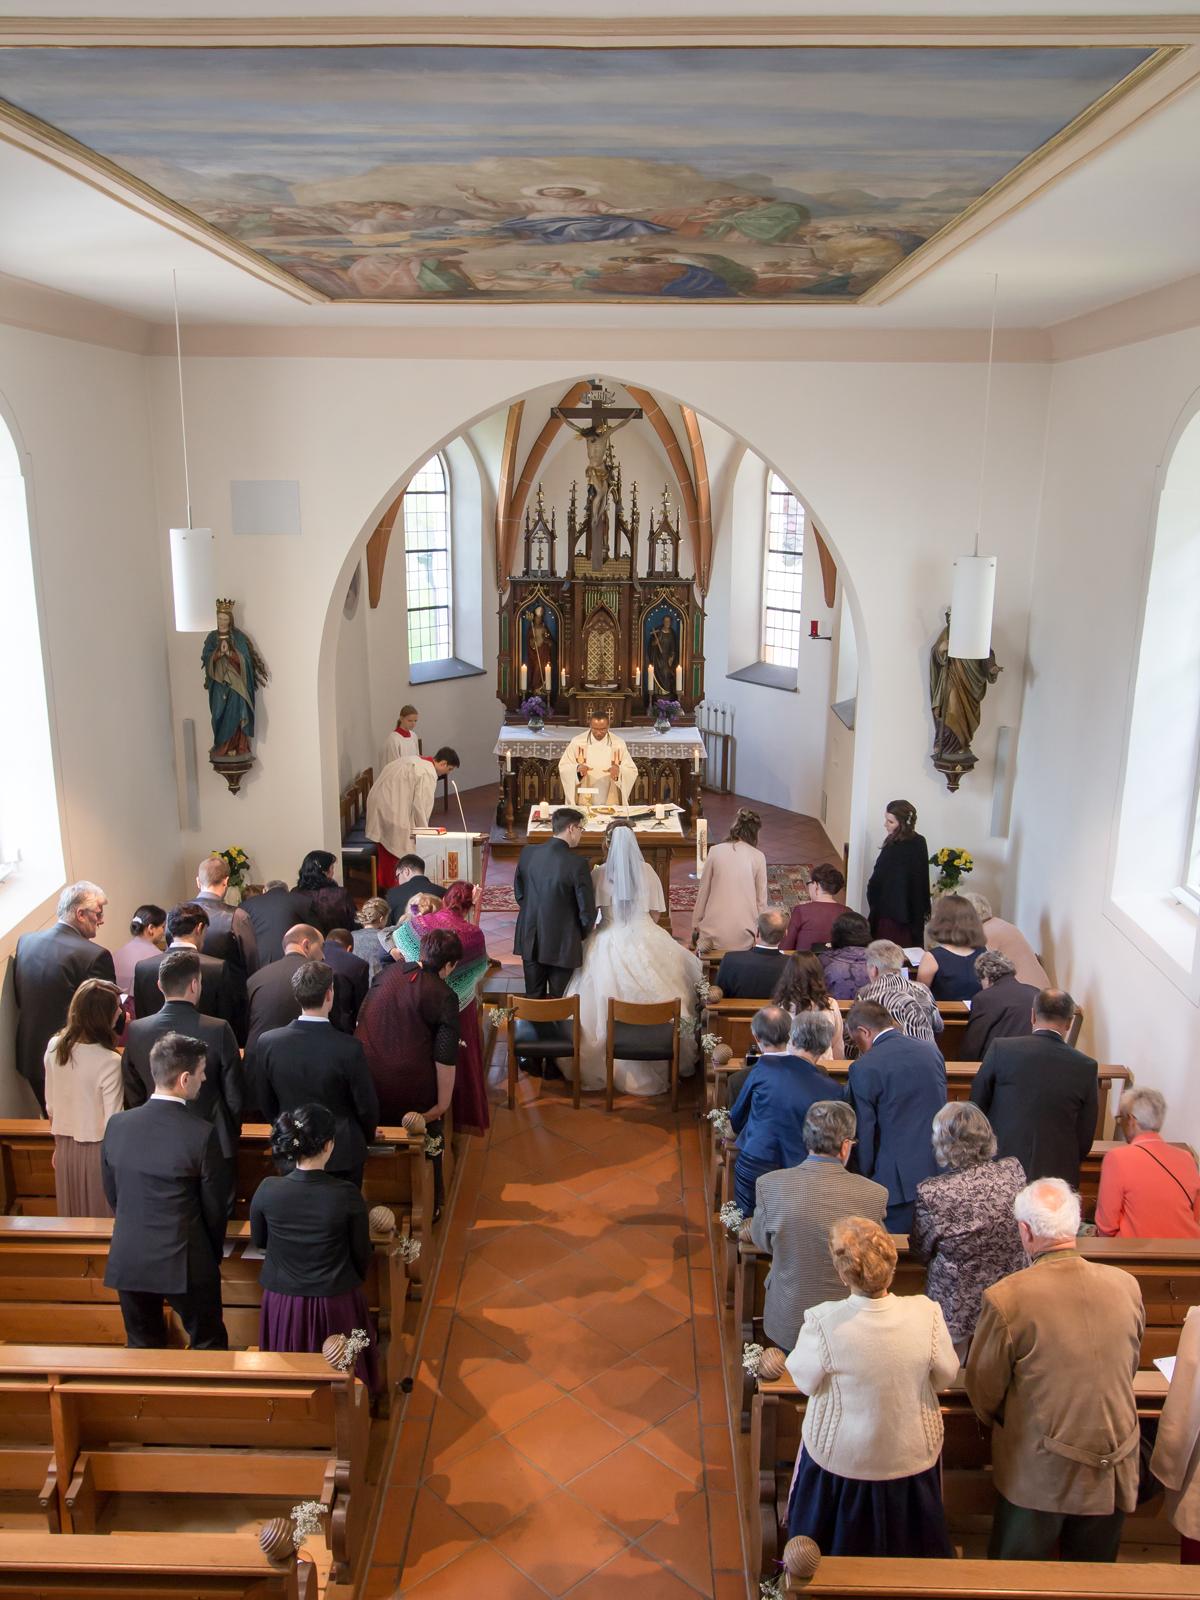 St. Gallus Kirche, Rißeg